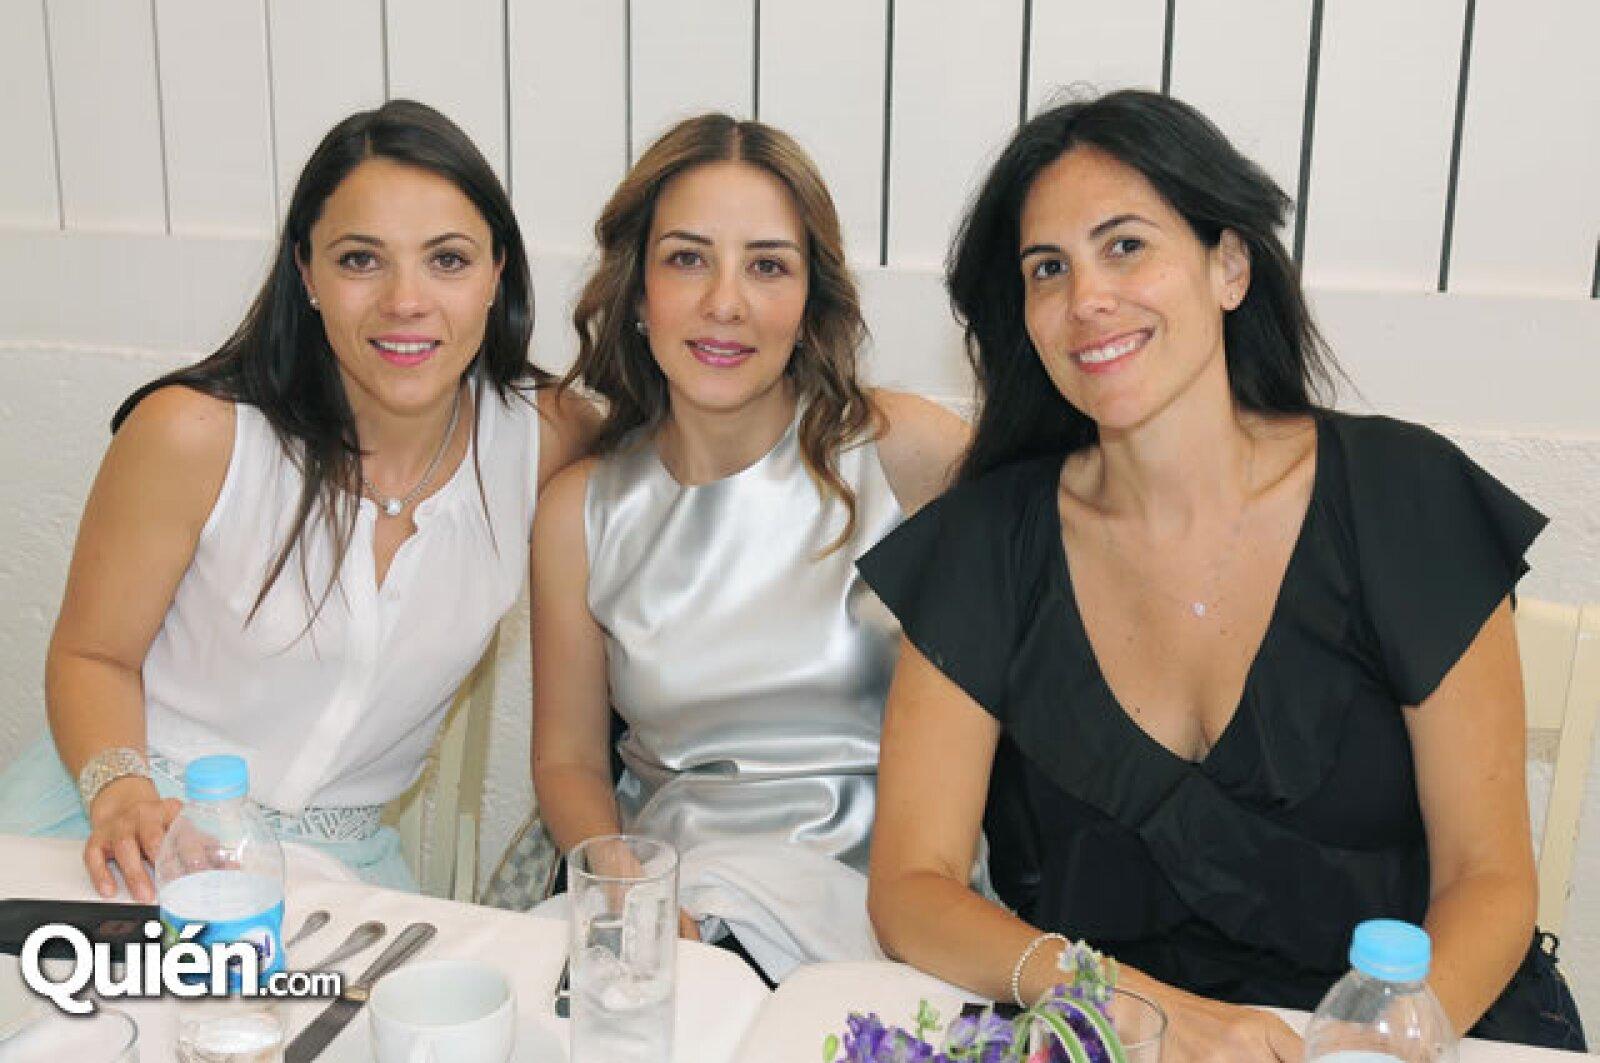 Mónica Muñoz,Olga Valls,Jessica Lambroso